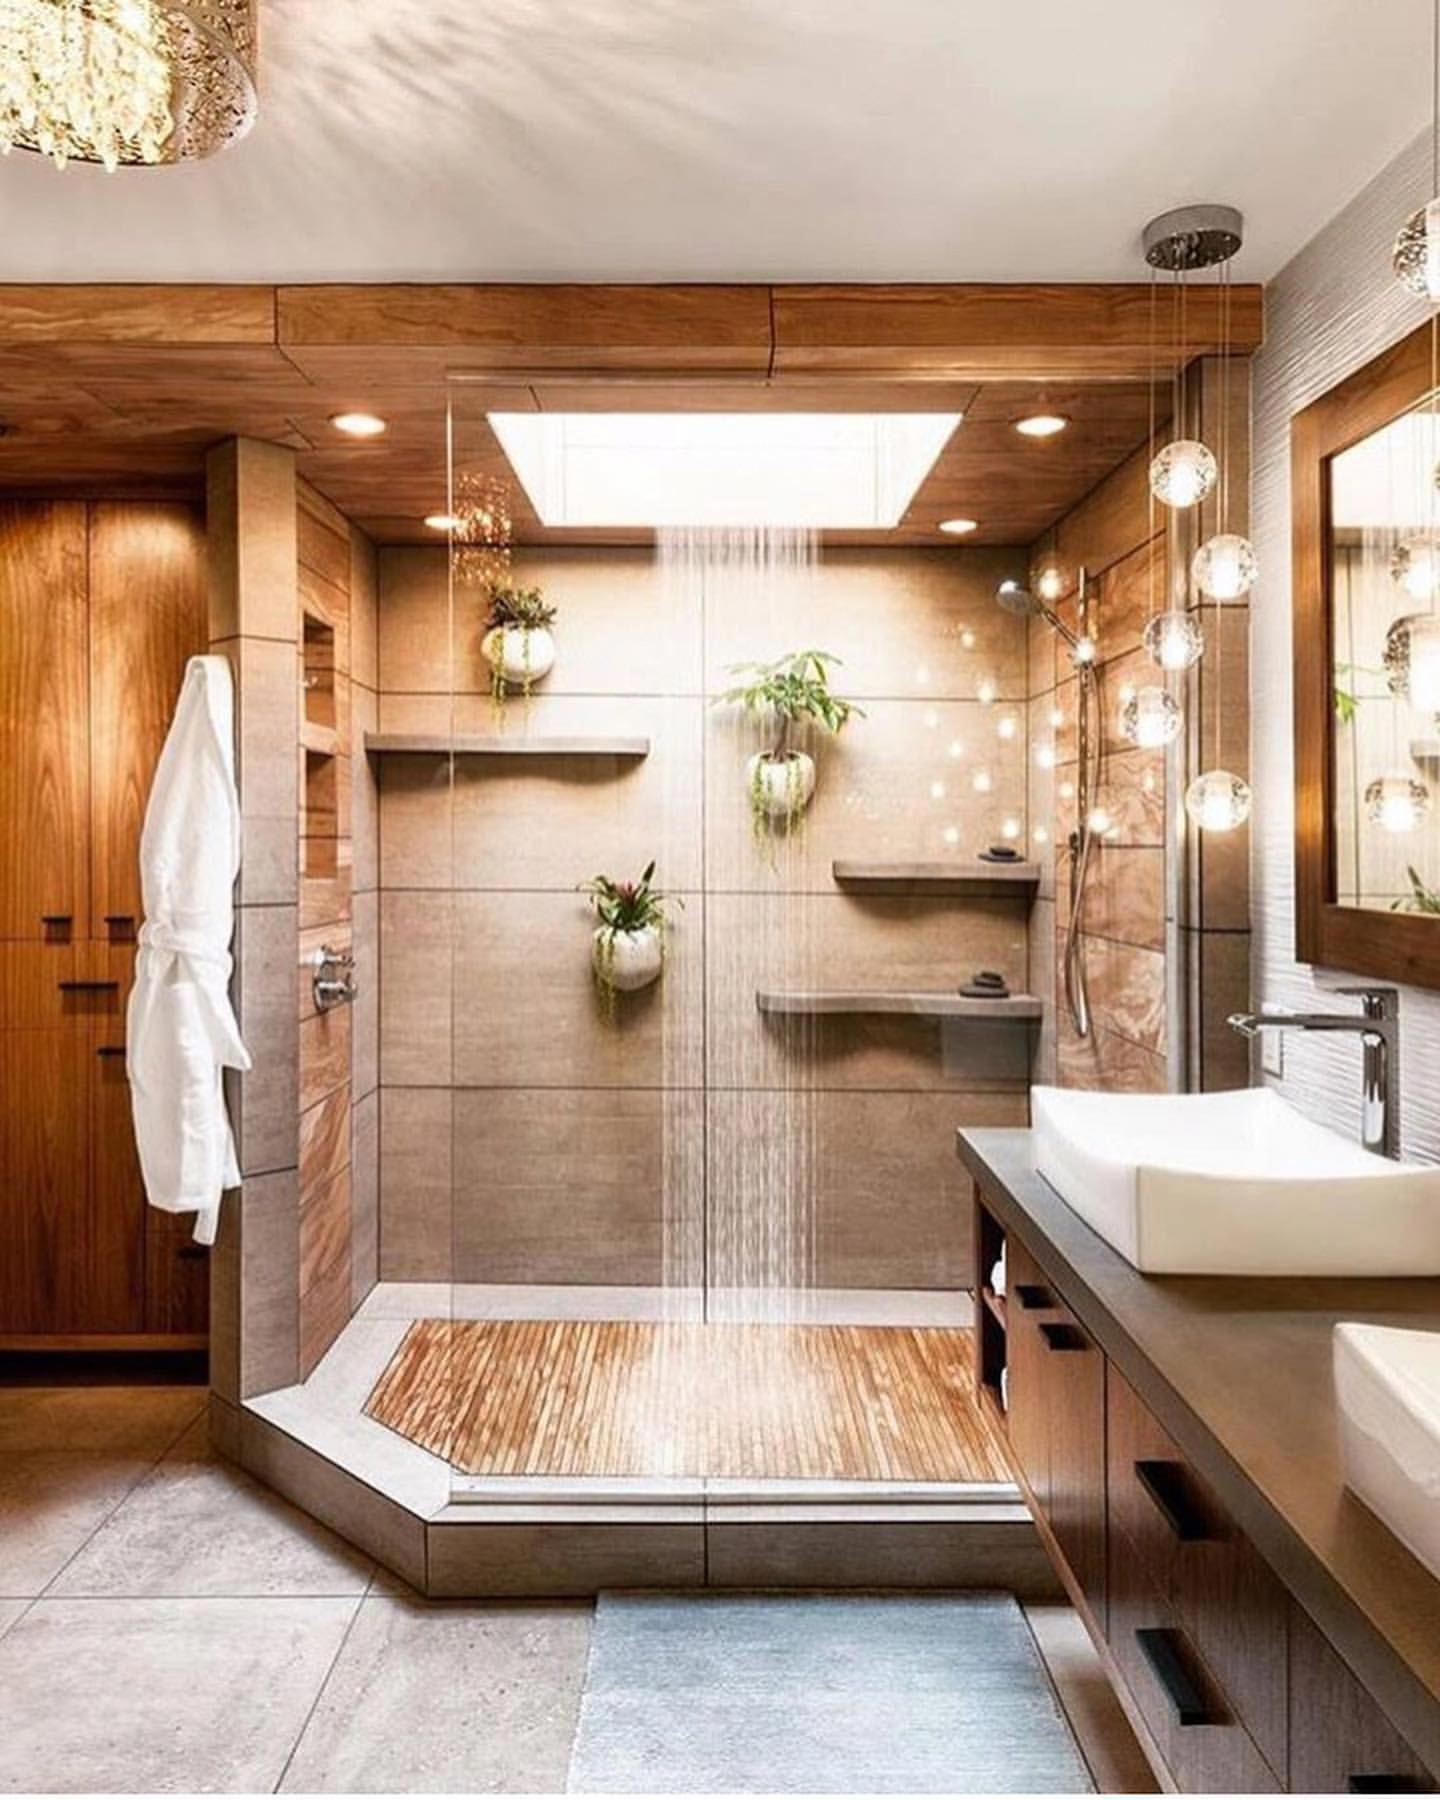 900 Cute Bathroom Ideas In 2021 Bathrooms Remodel Design Inspiration